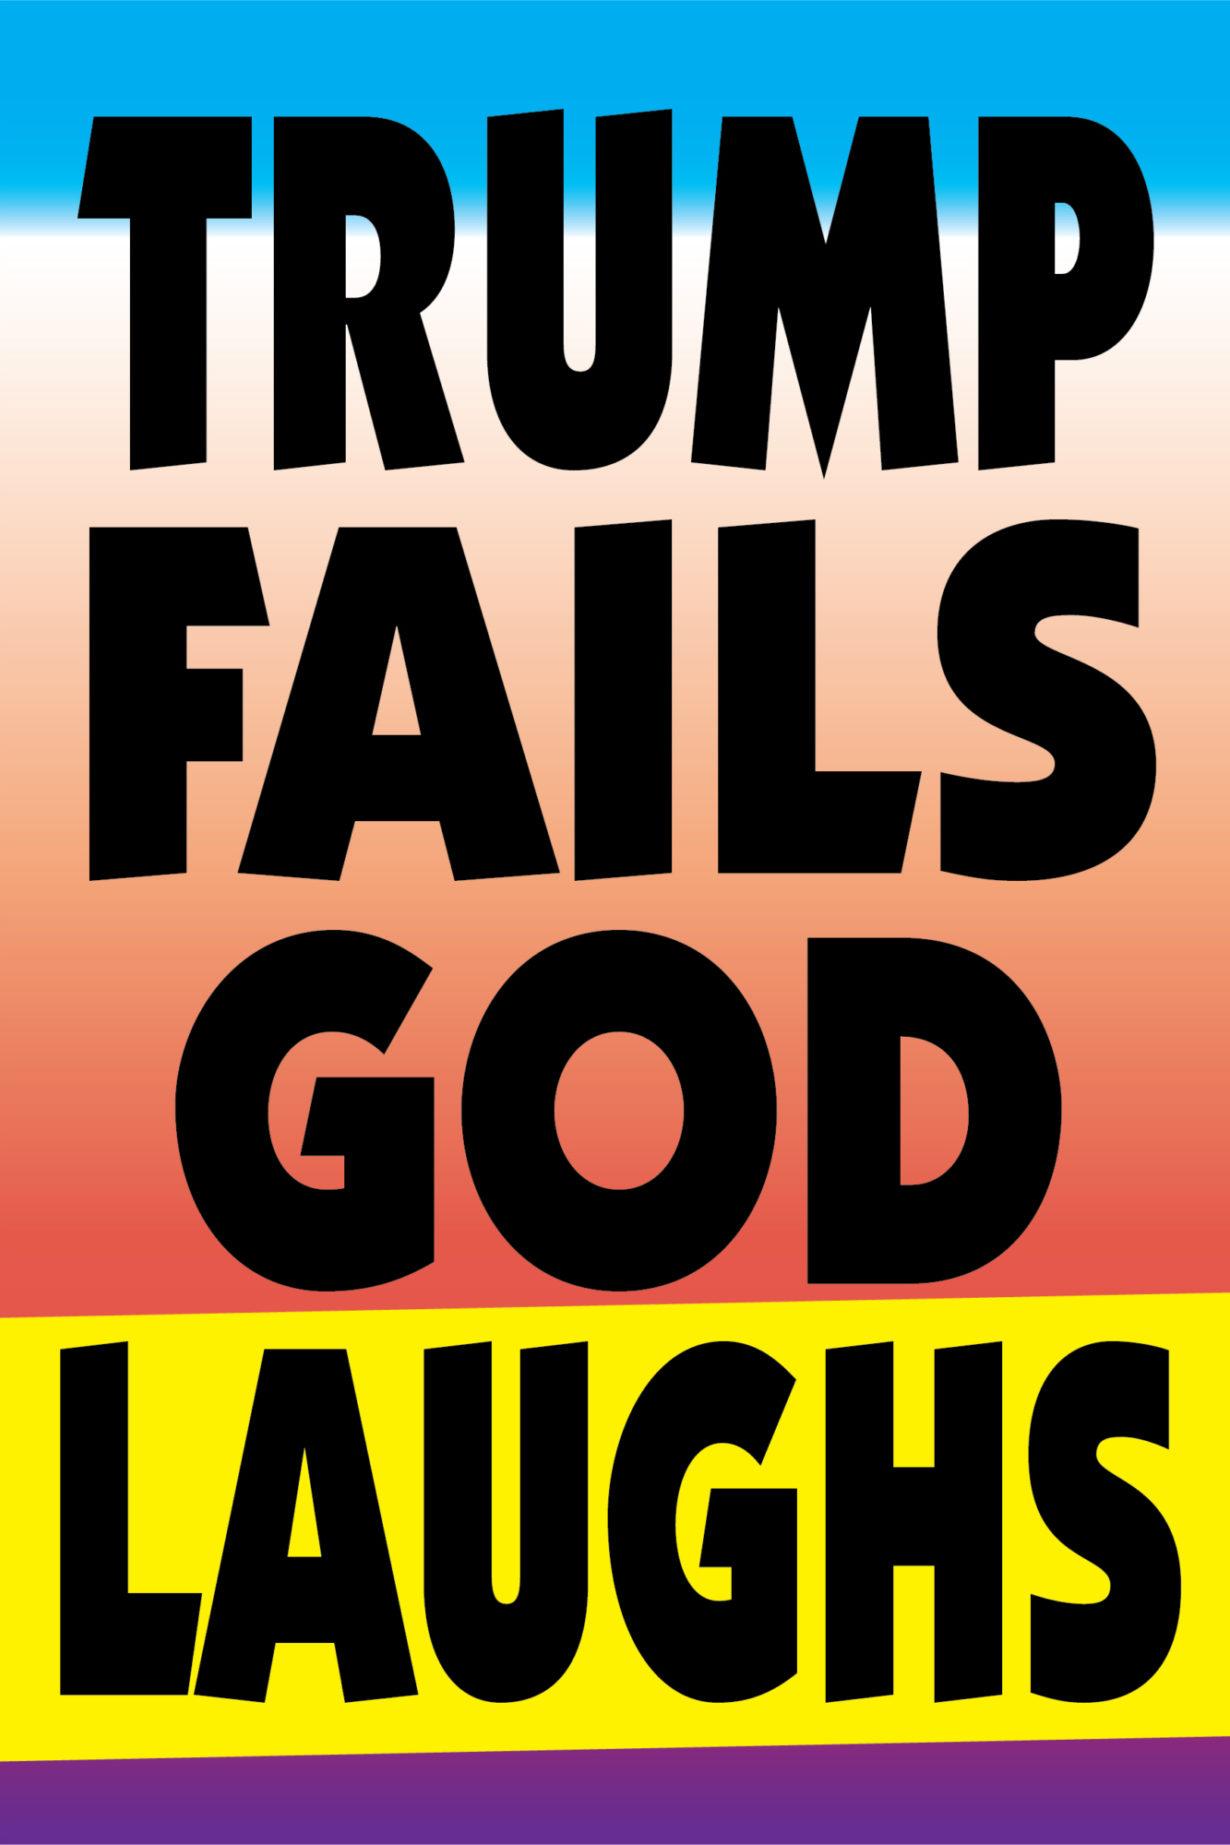 NP_76_100_2017_Trump-Fails-God-Laughs.jpg